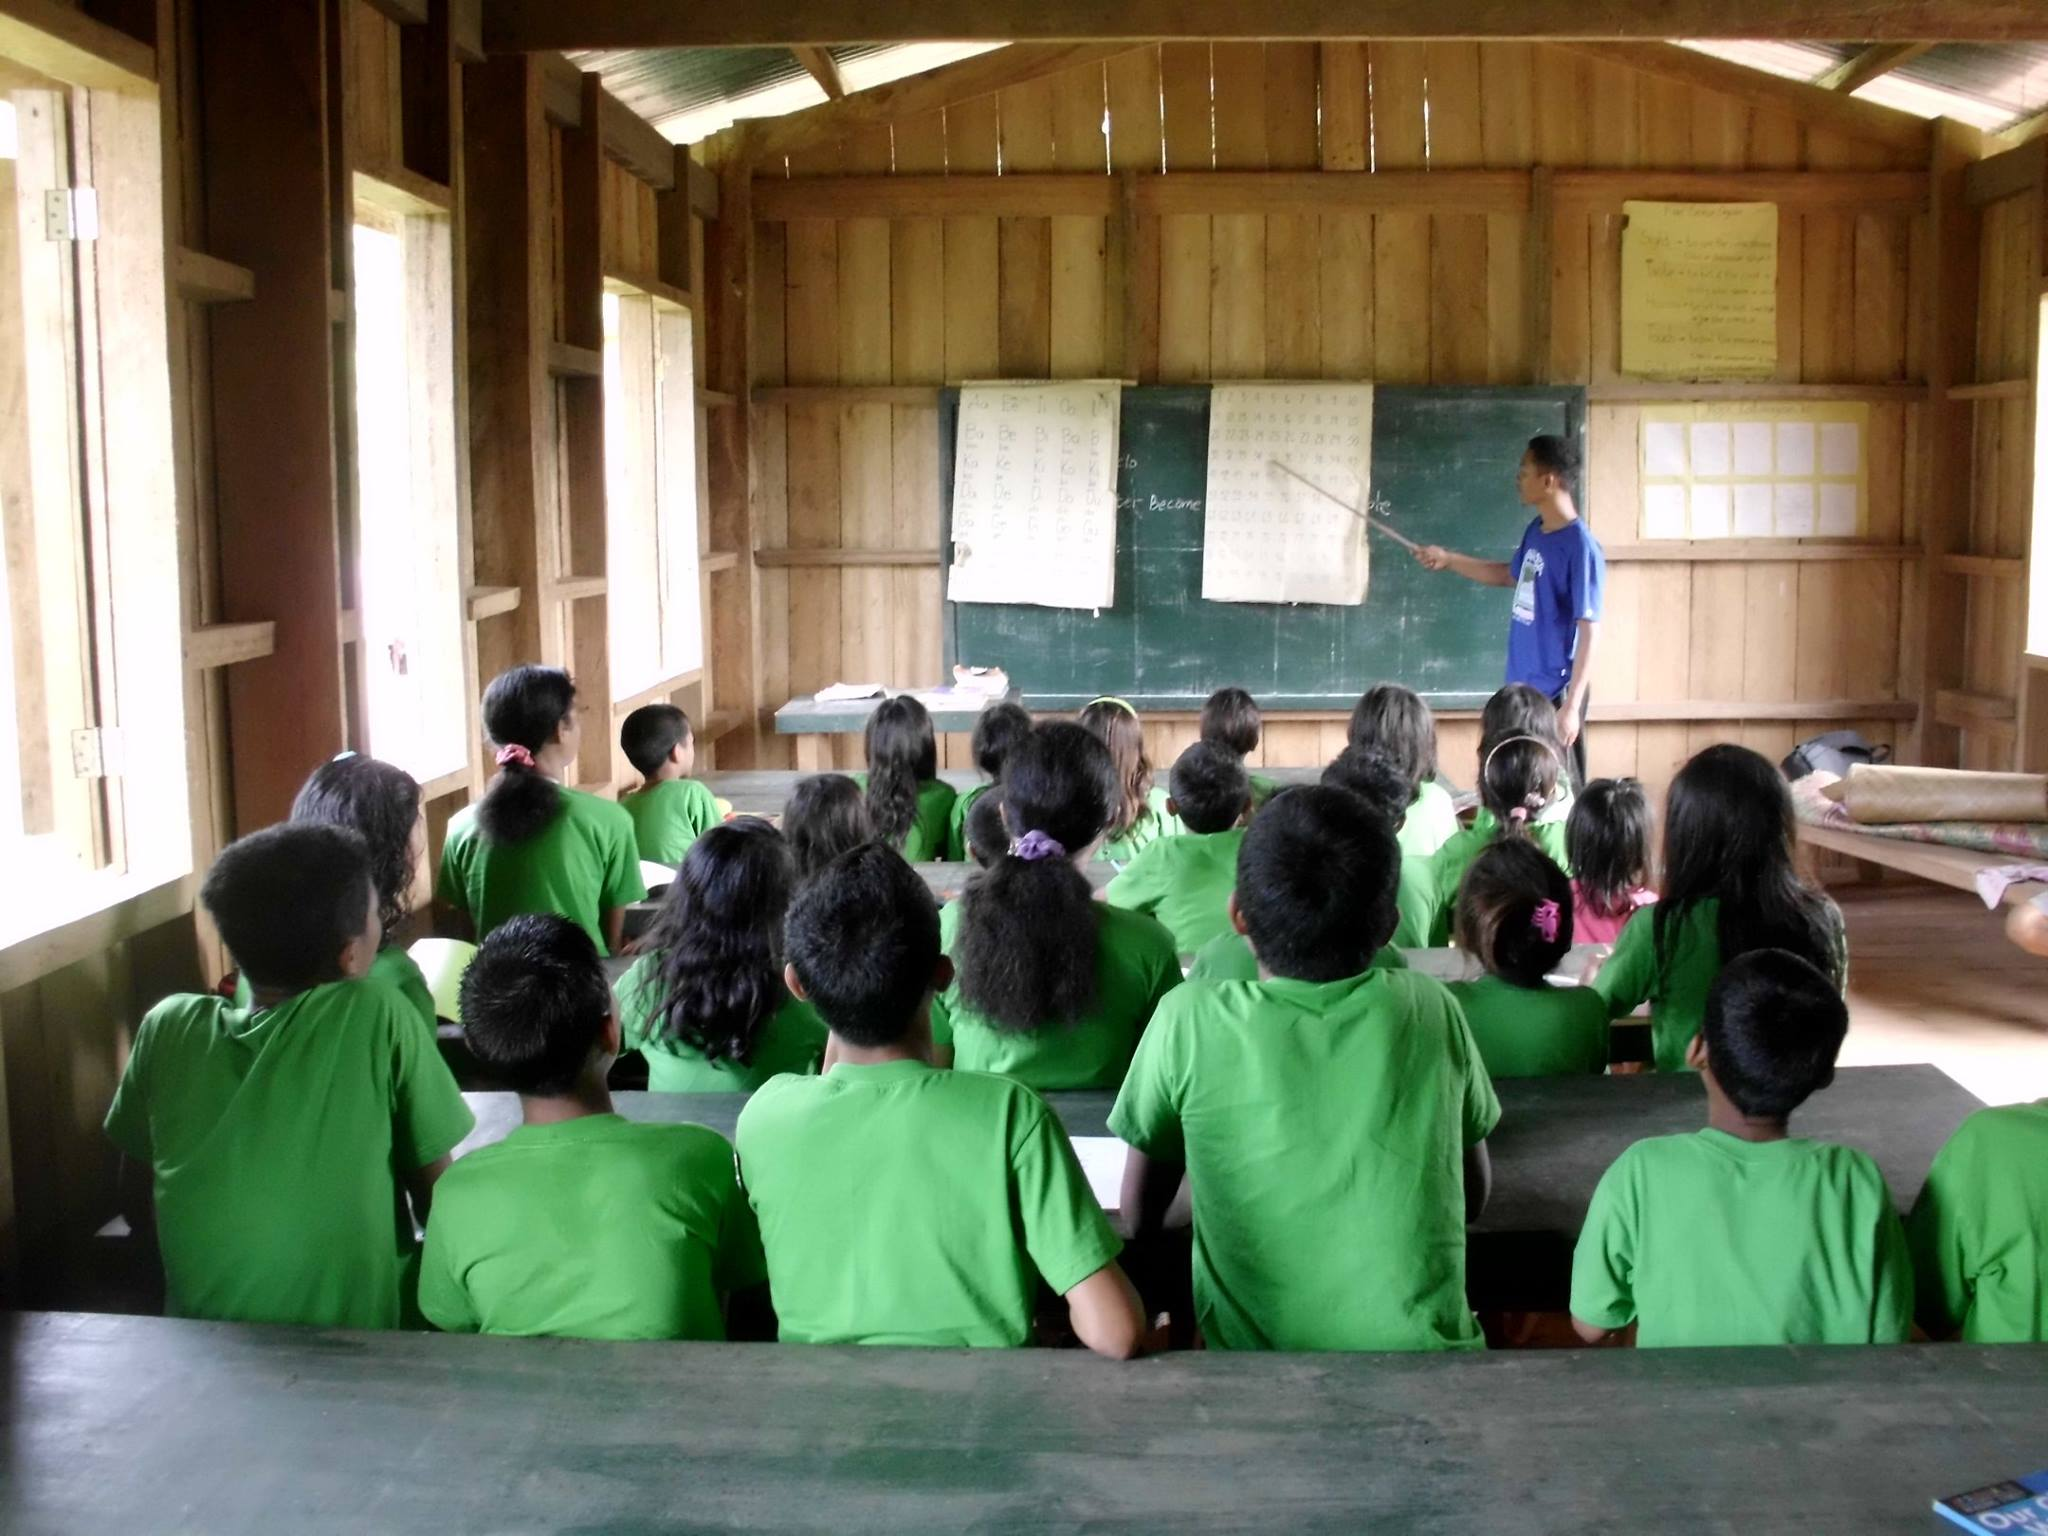 Students and teacher. (image via Myrna Lou Leagogo)